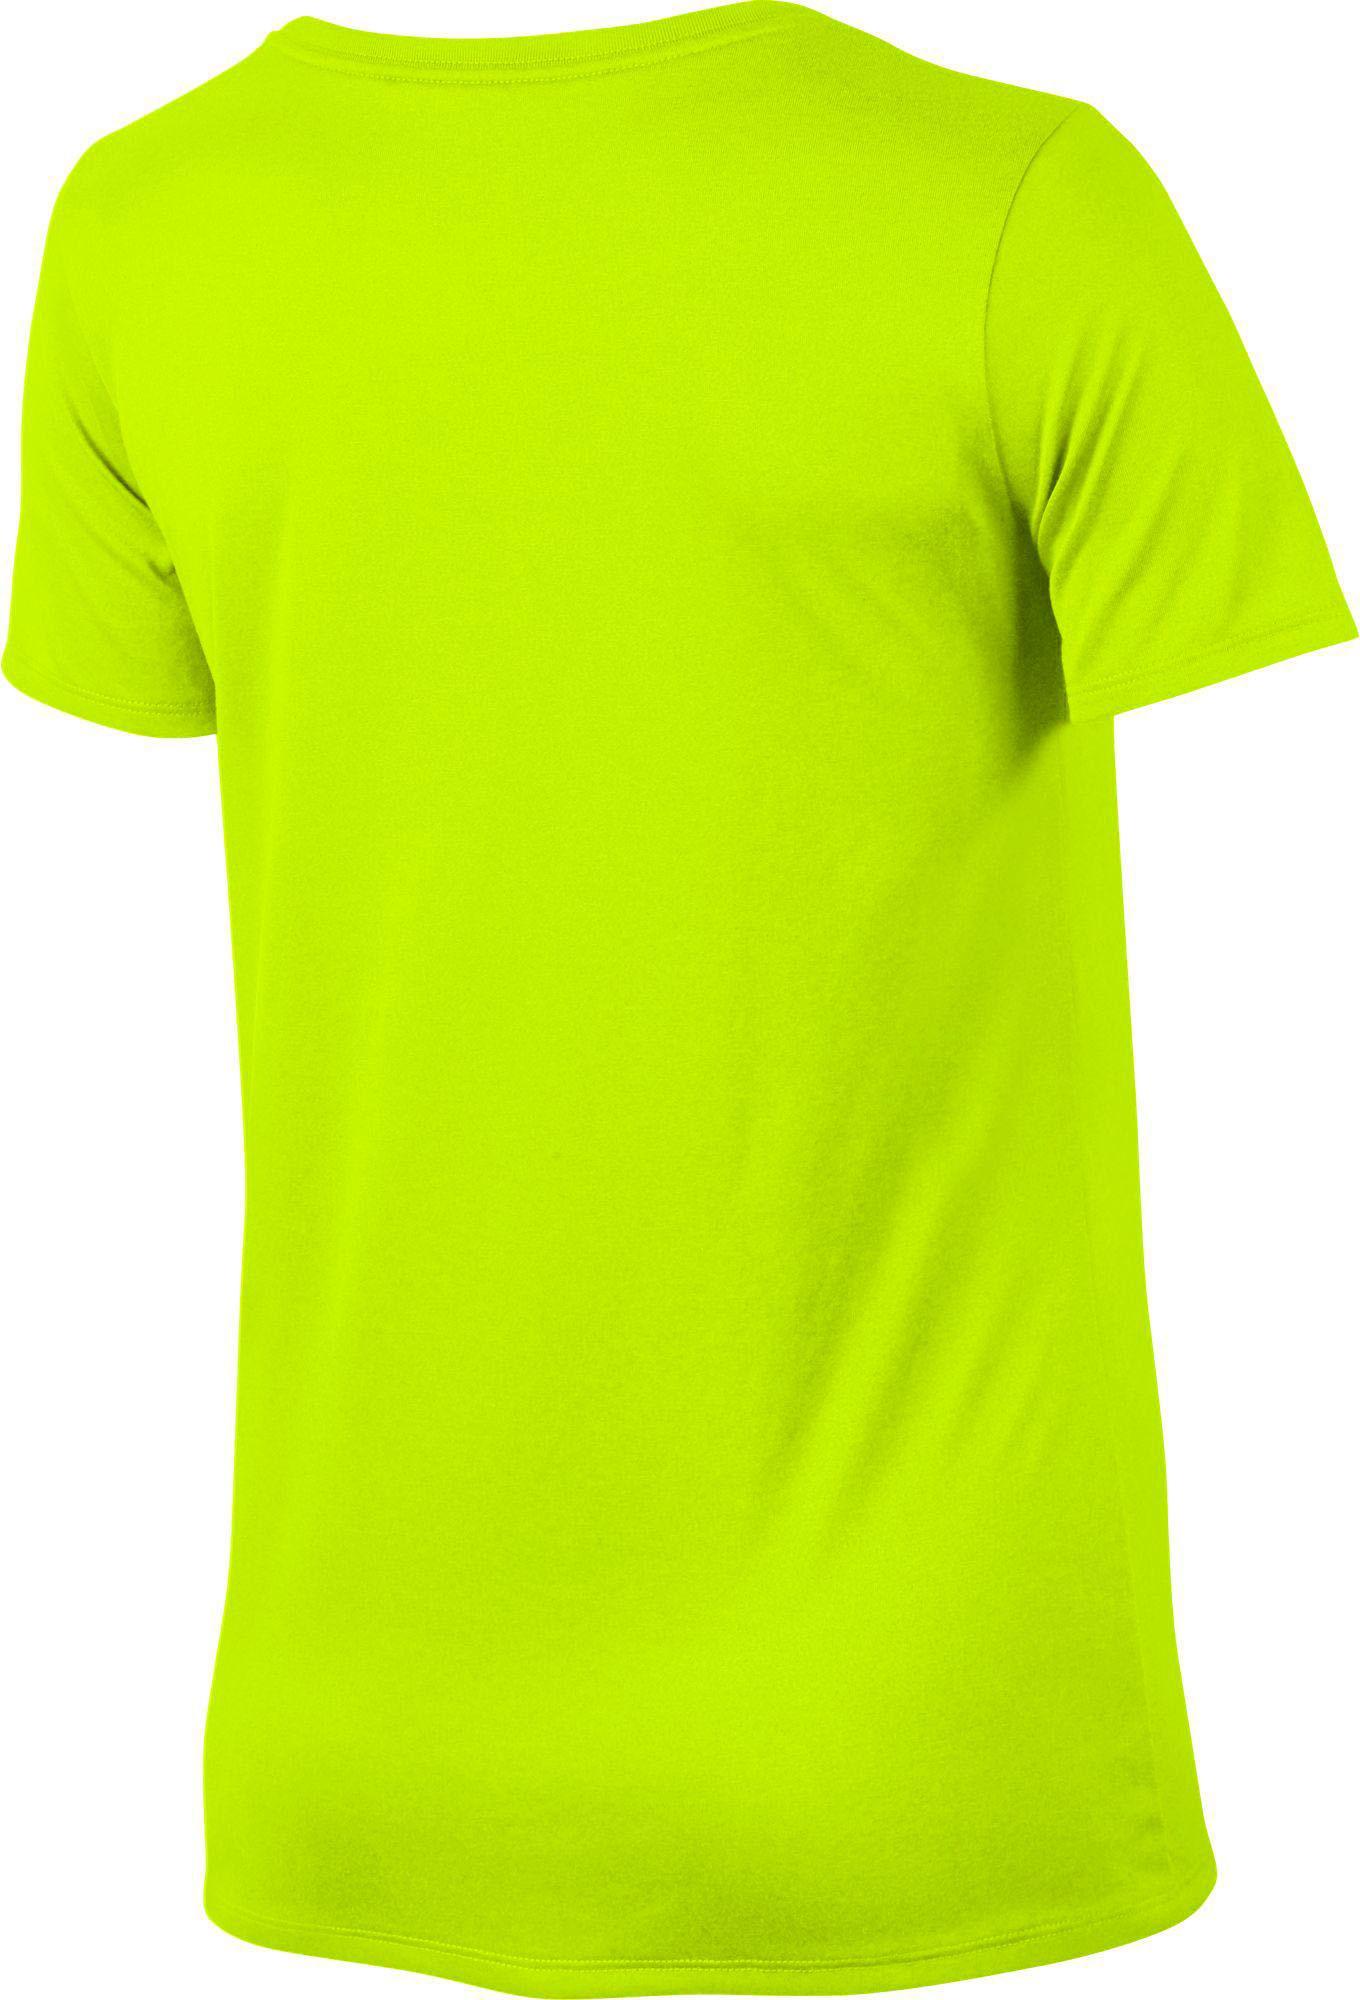 349eb492874e Nike - Green Woman s Dry Legend Training T-shirt - Lyst. View fullscreen